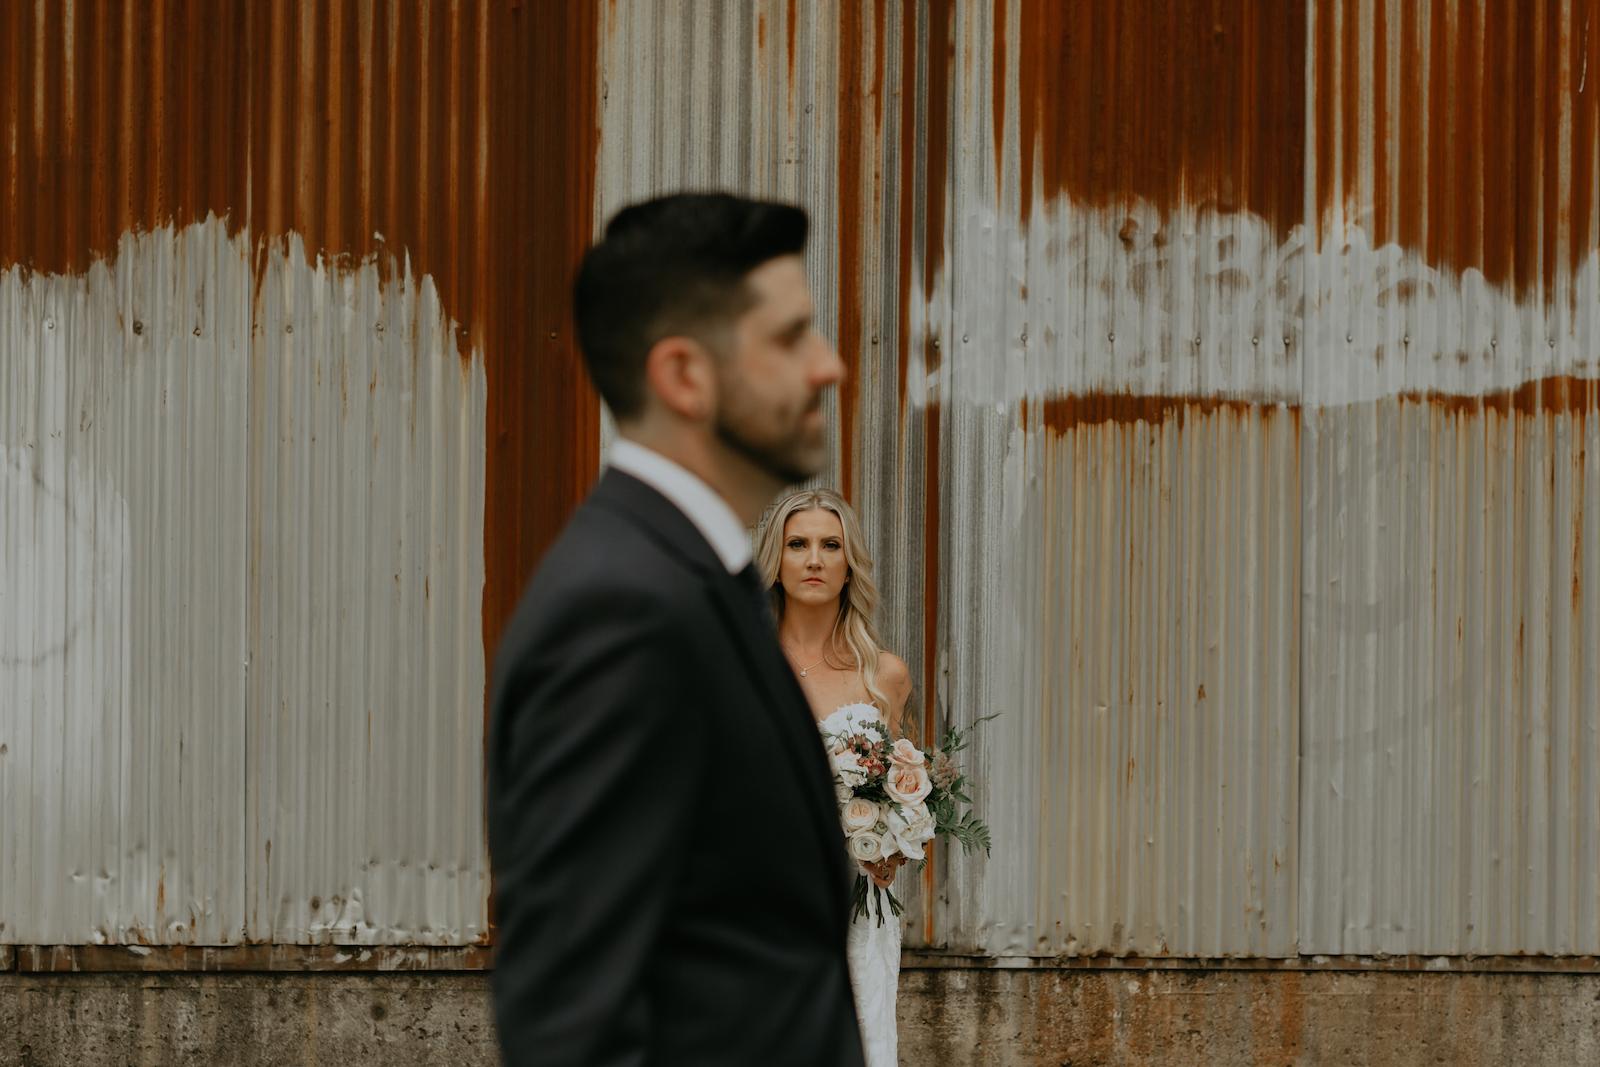 Industrial-Vibe-Wedding-Sambajoy-Photo-Art-22.jpg